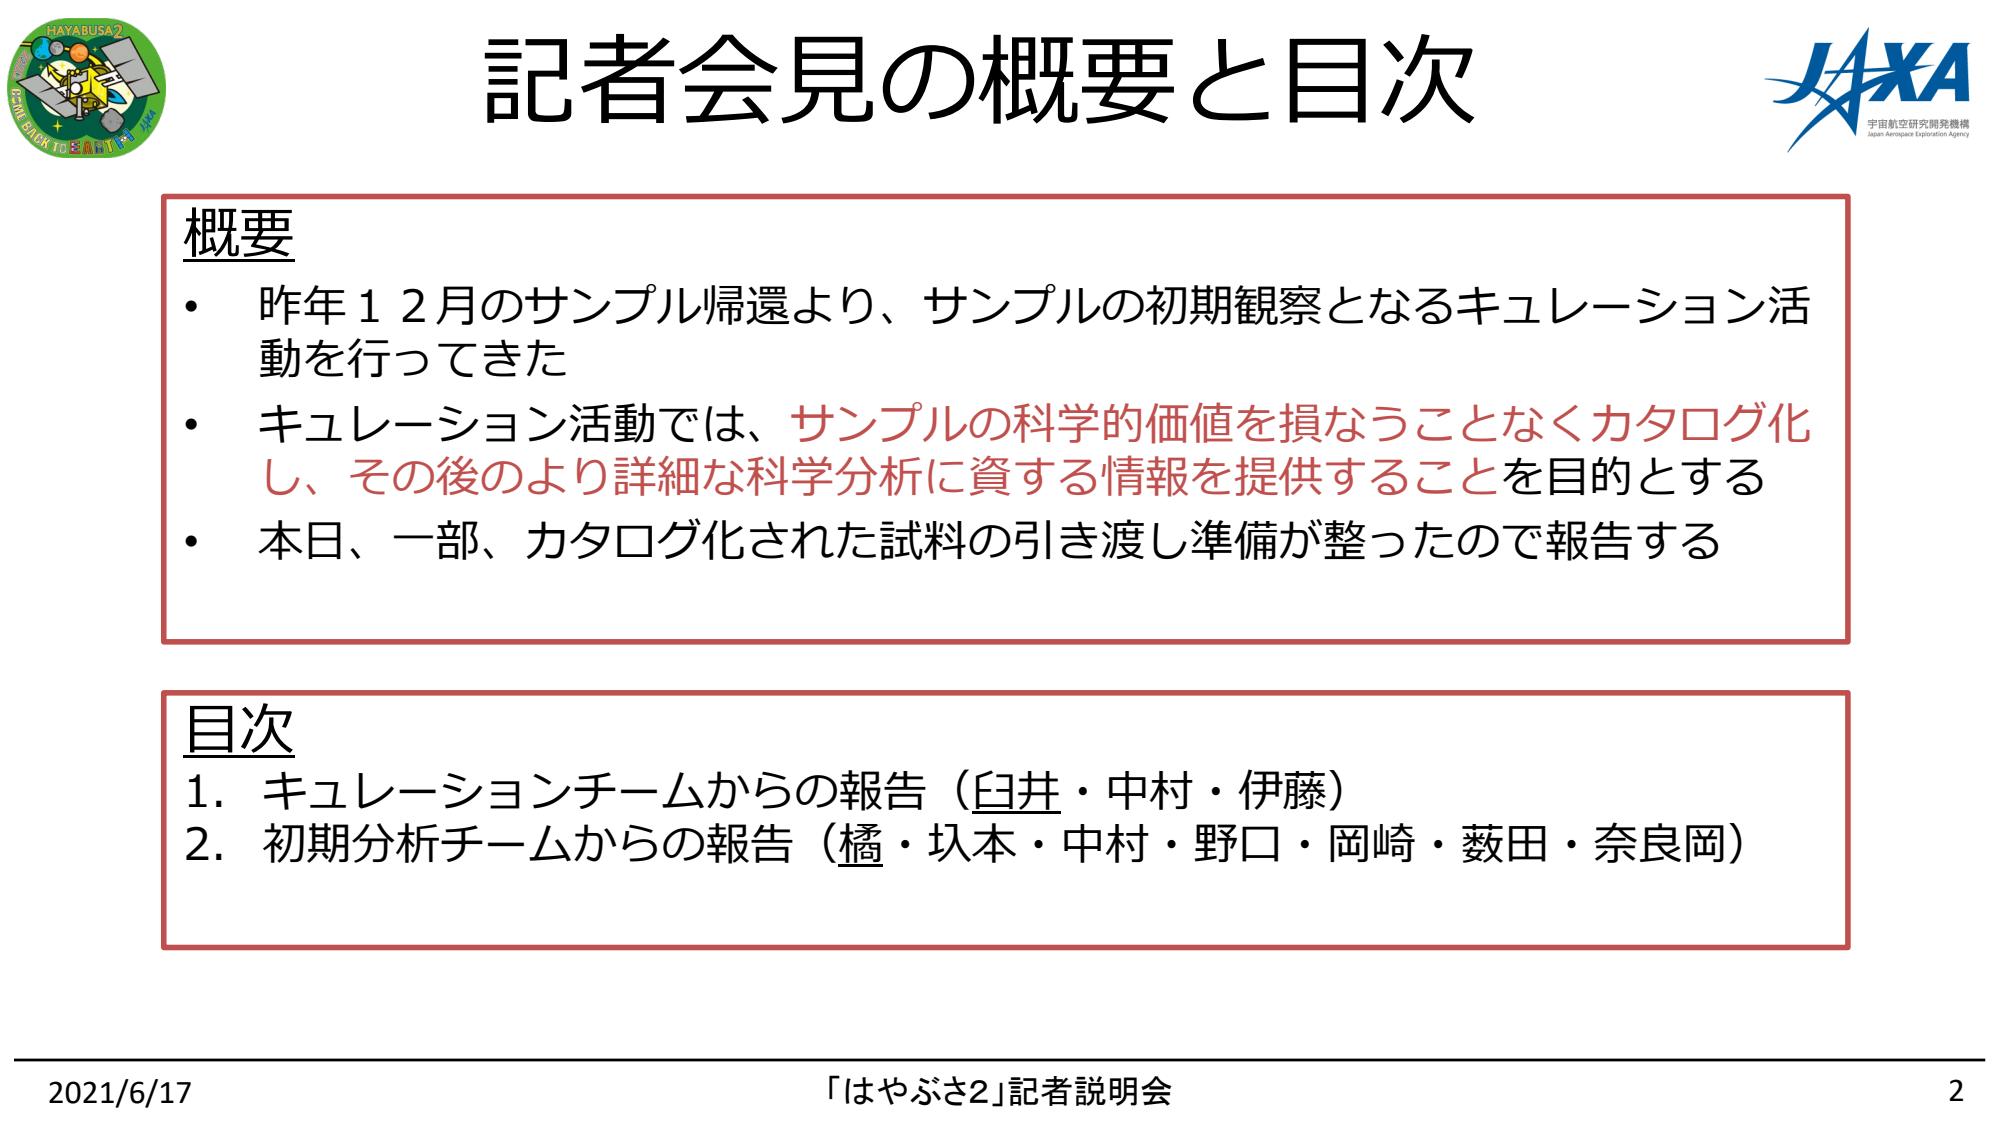 f:id:Imamura:20210617130106p:plain